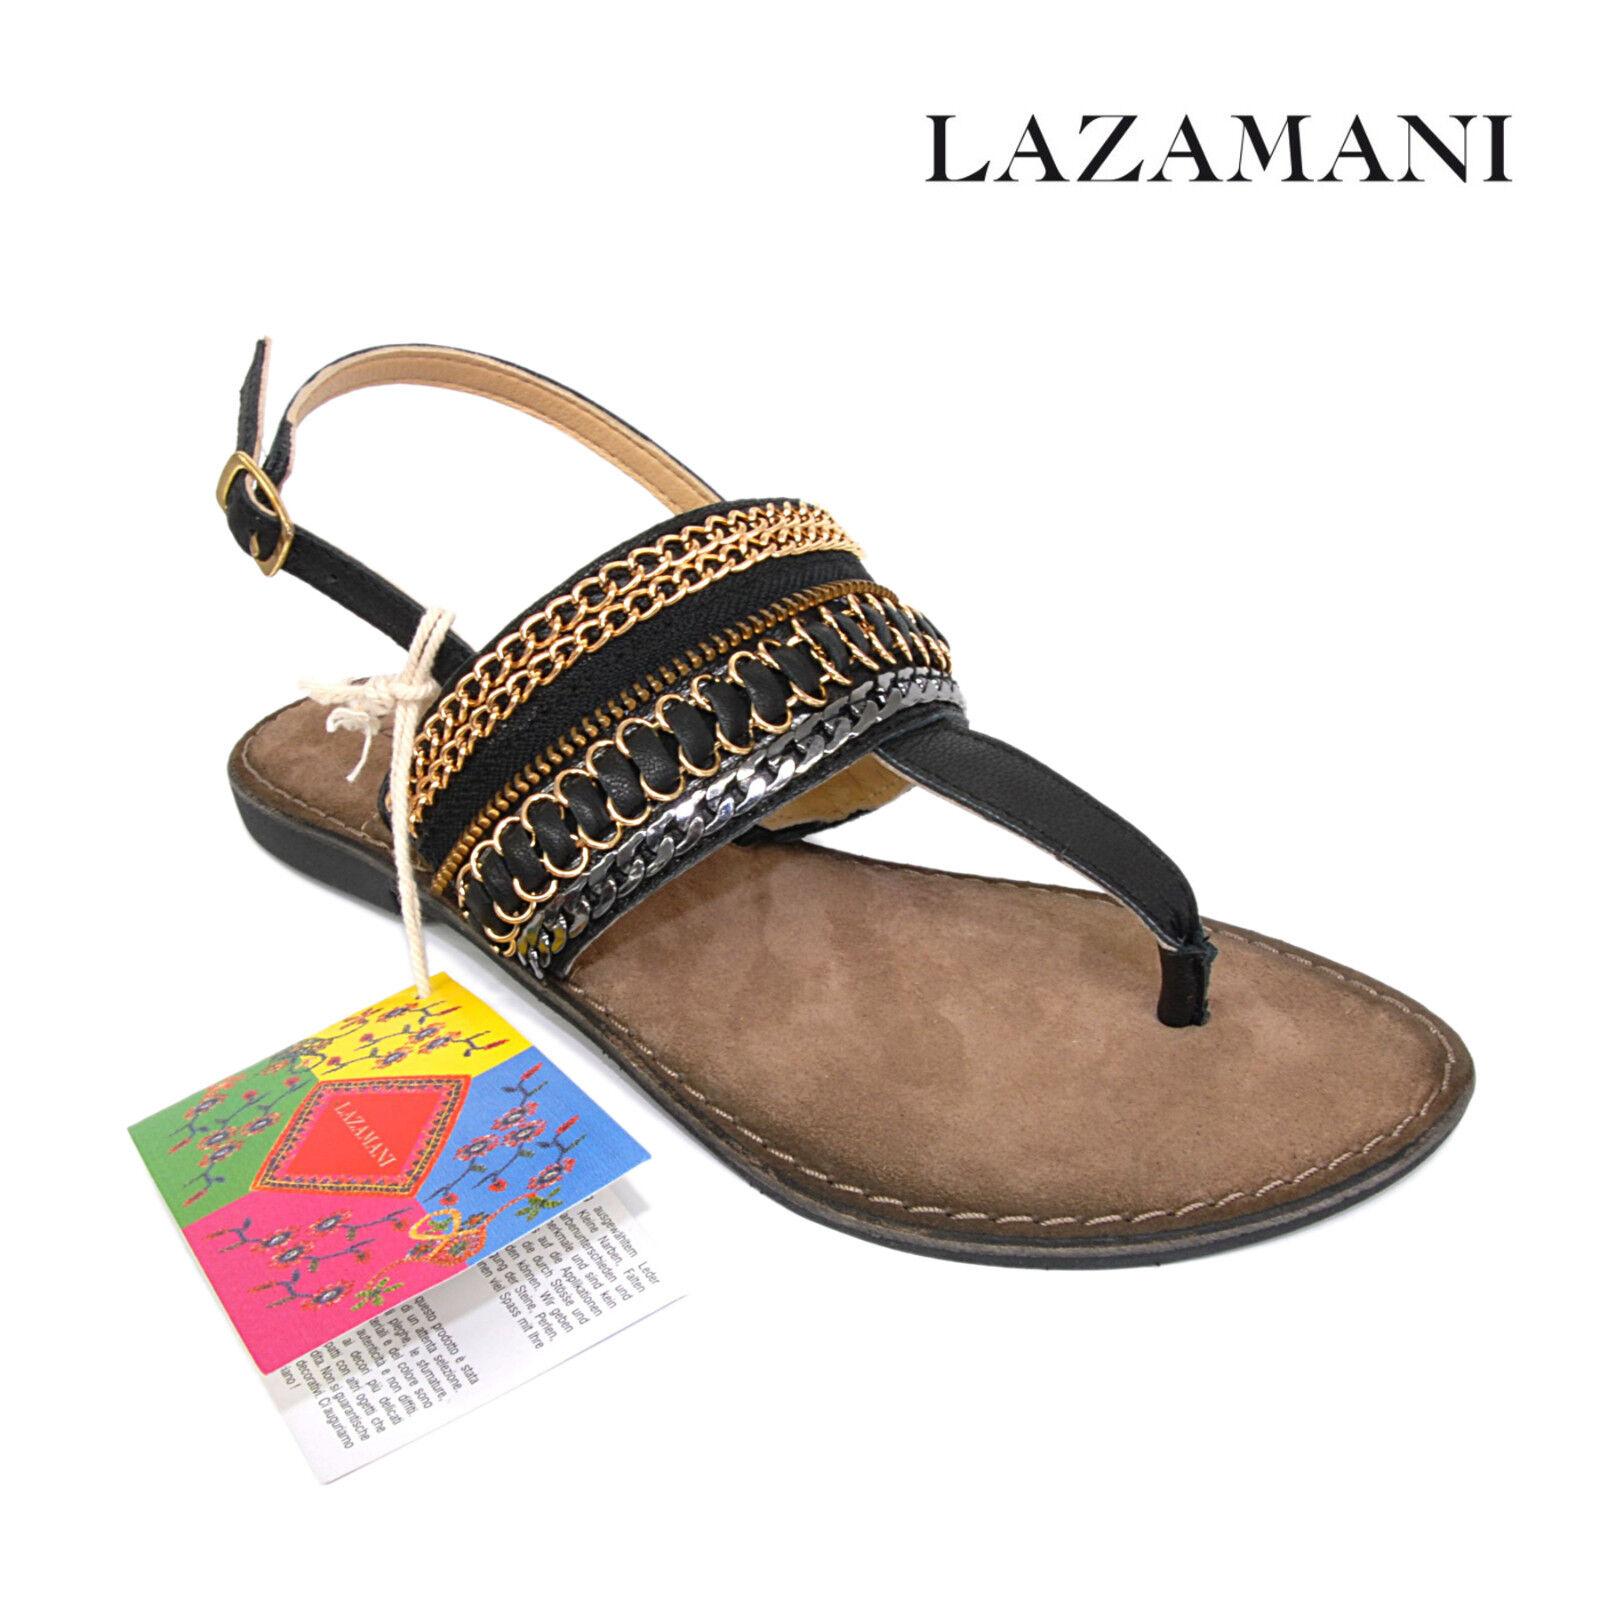 LAZAMANI LAZAMANI LAZAMANI Damen Schuhe Sandalette Zehentrenner flach 33.630 in schwarz gold 3be09d